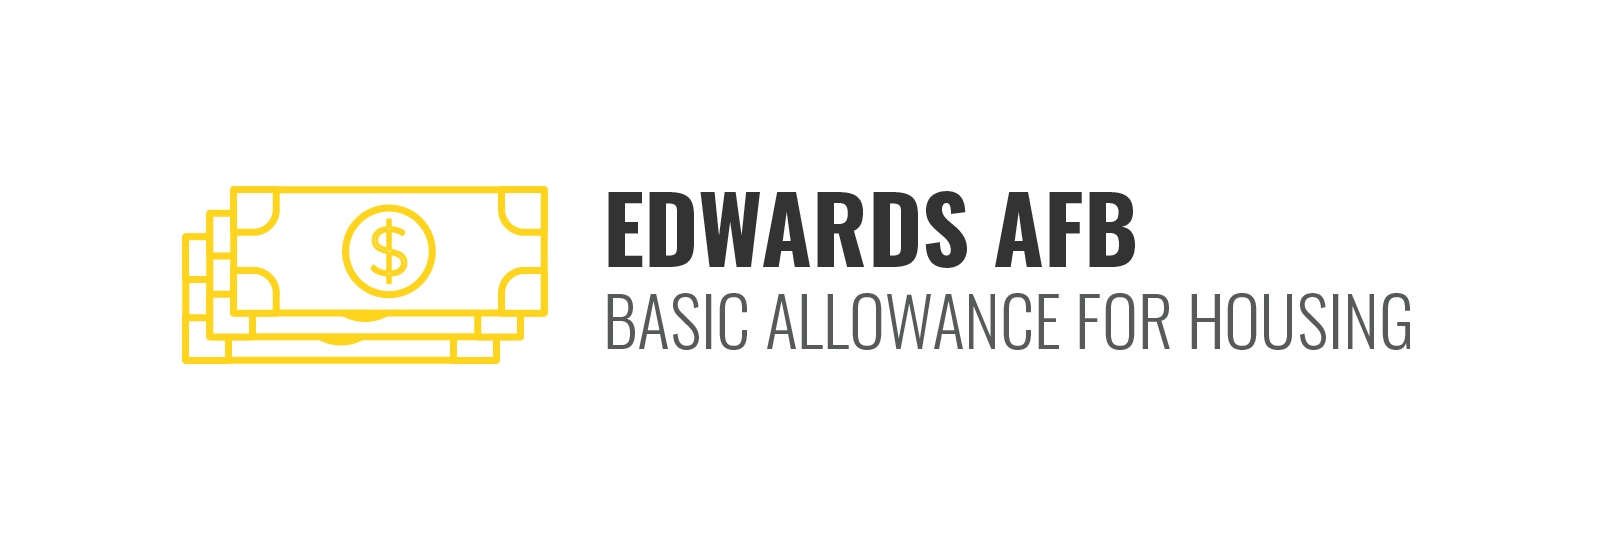 Edwards AFB BAH